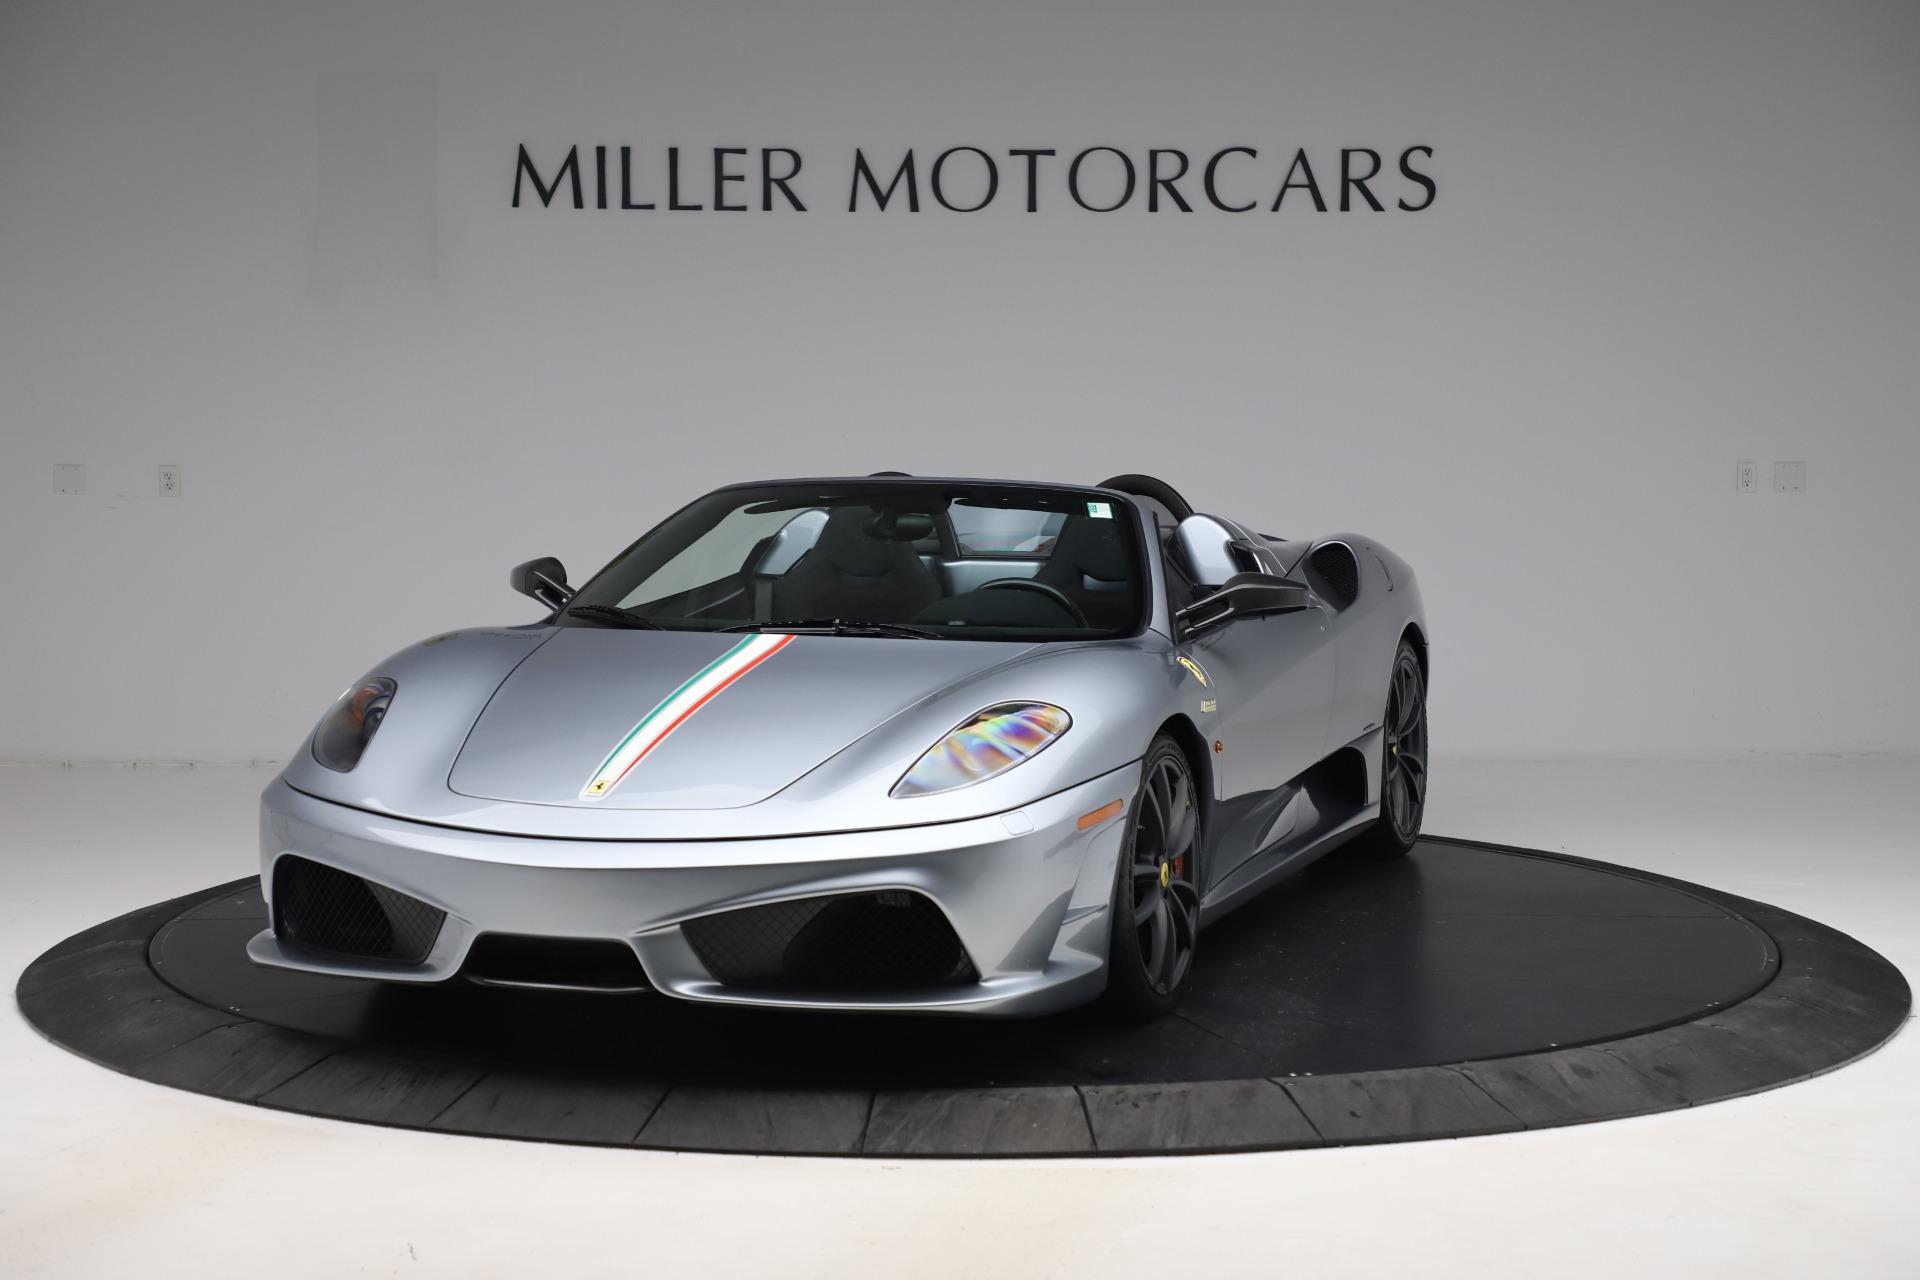 Used 2009 Ferrari 430 Scuderia Spider 16M for sale $324,900 at Bentley Greenwich in Greenwich CT 06830 1